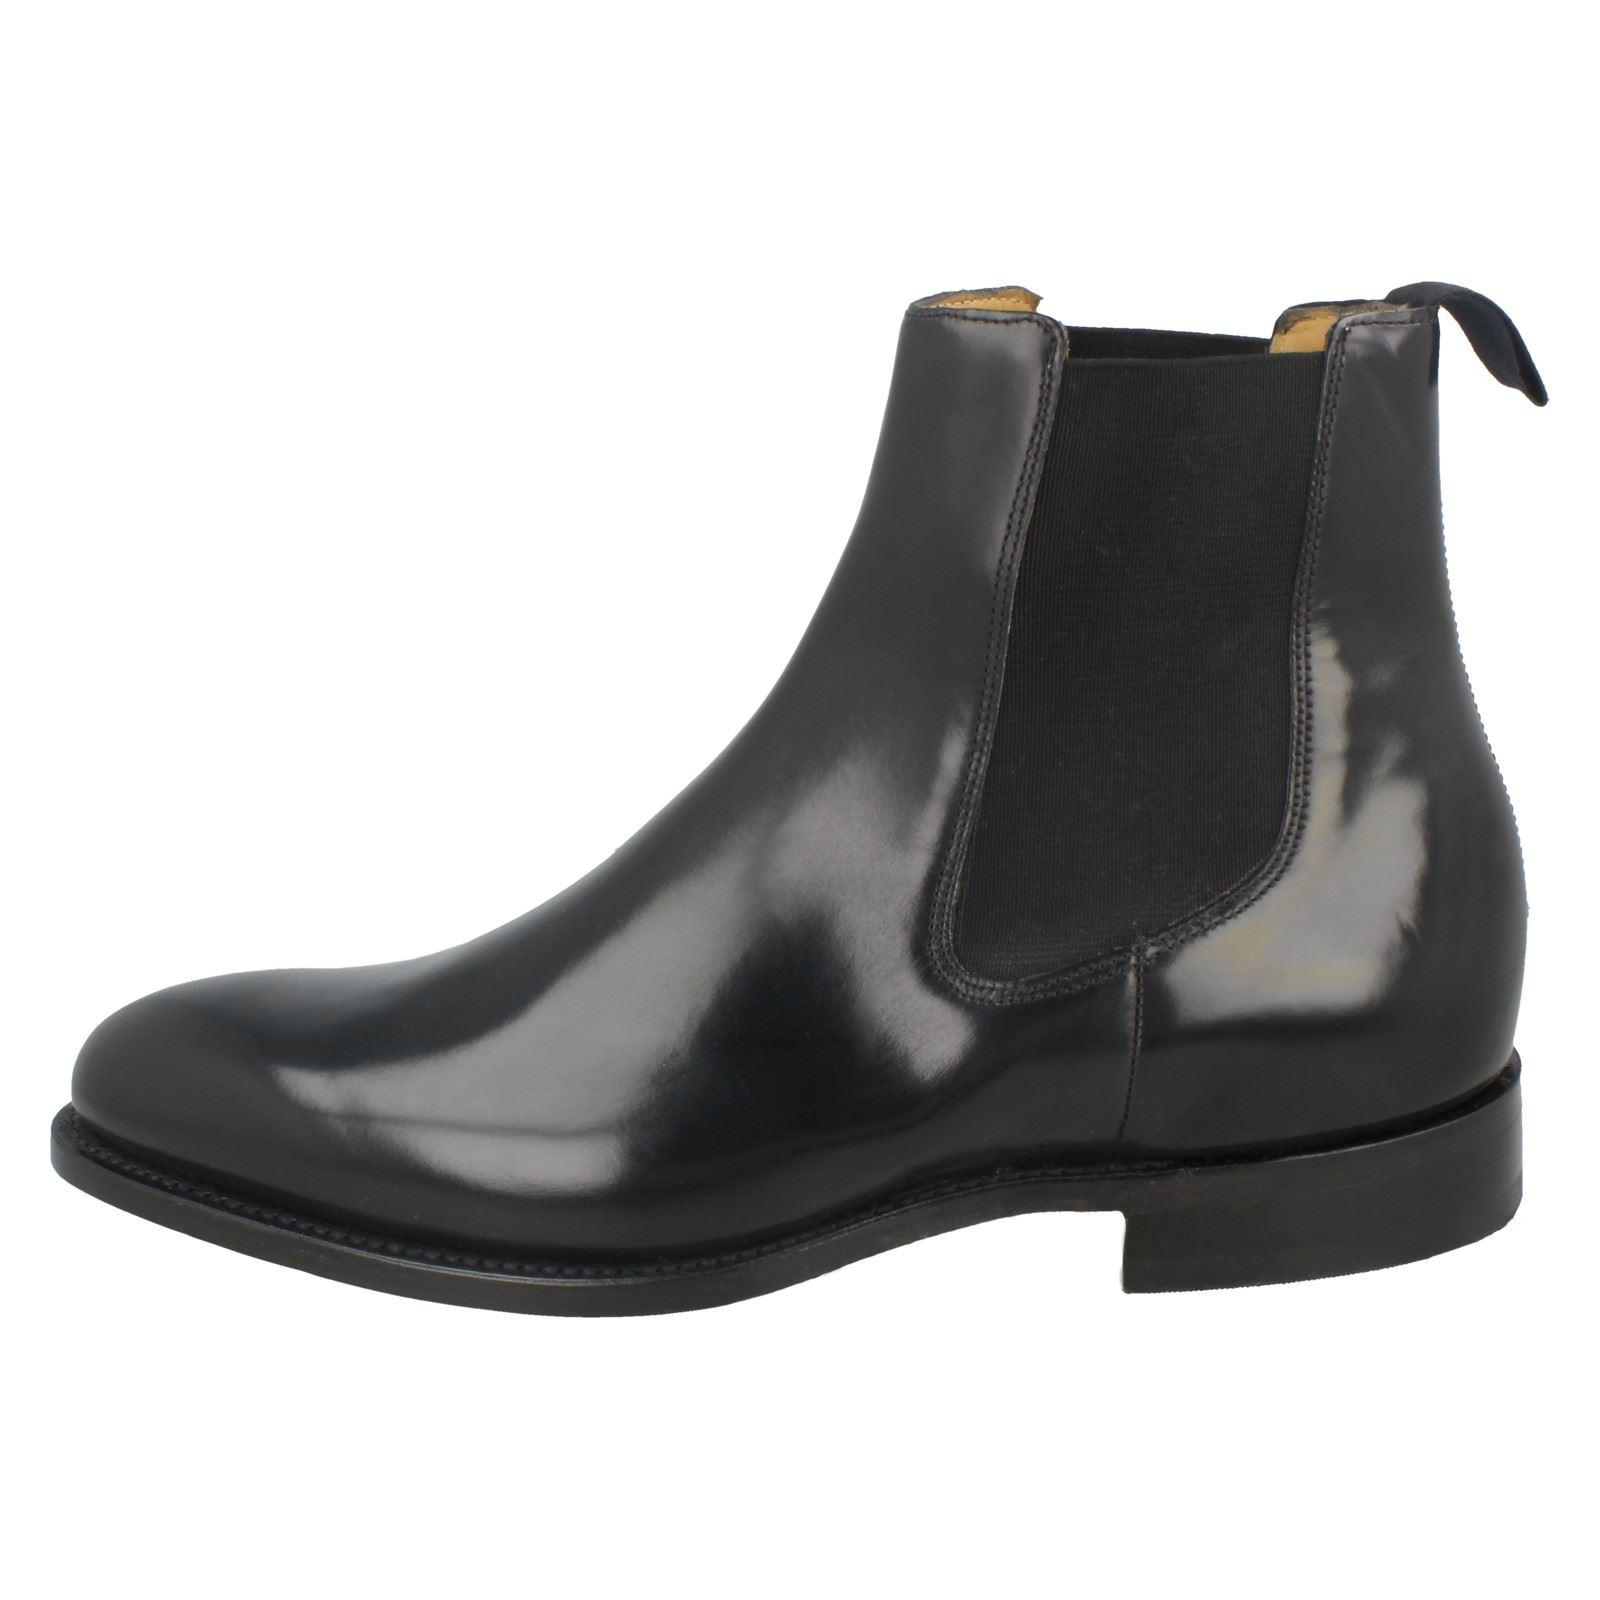 barker chelsea boots sale off 53% - www